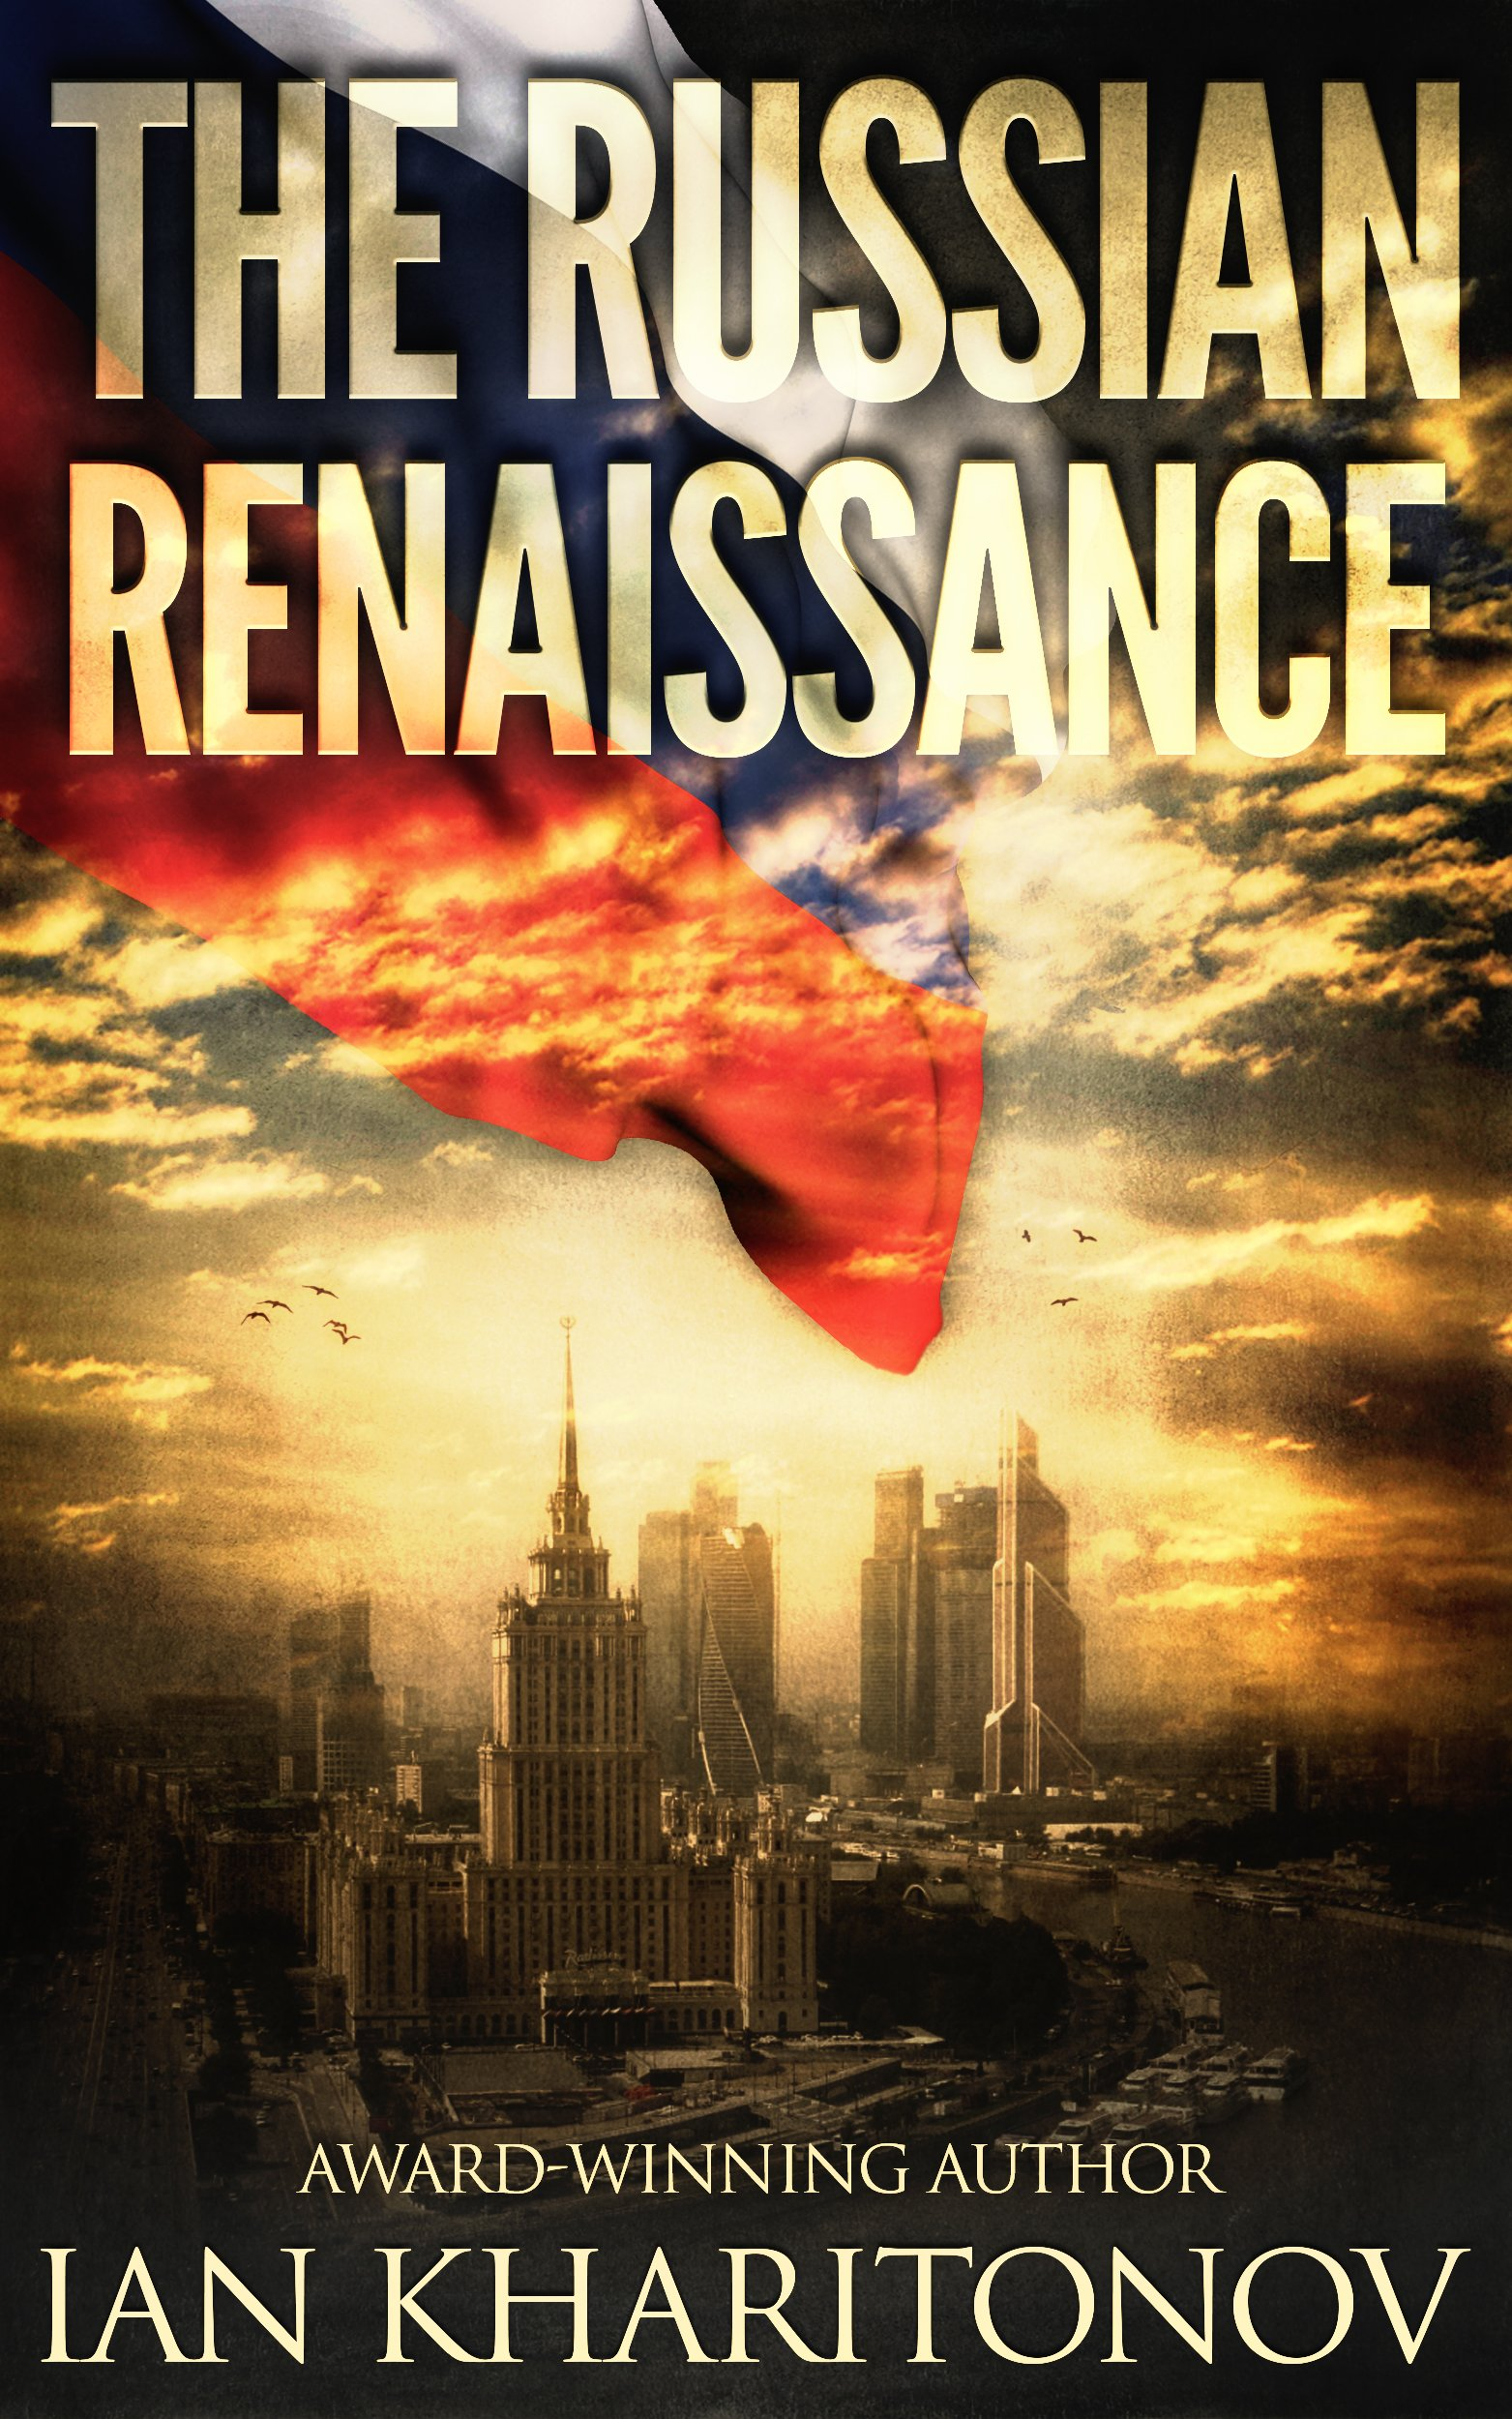 The Russian Renaissance (Sokolov Book 1)